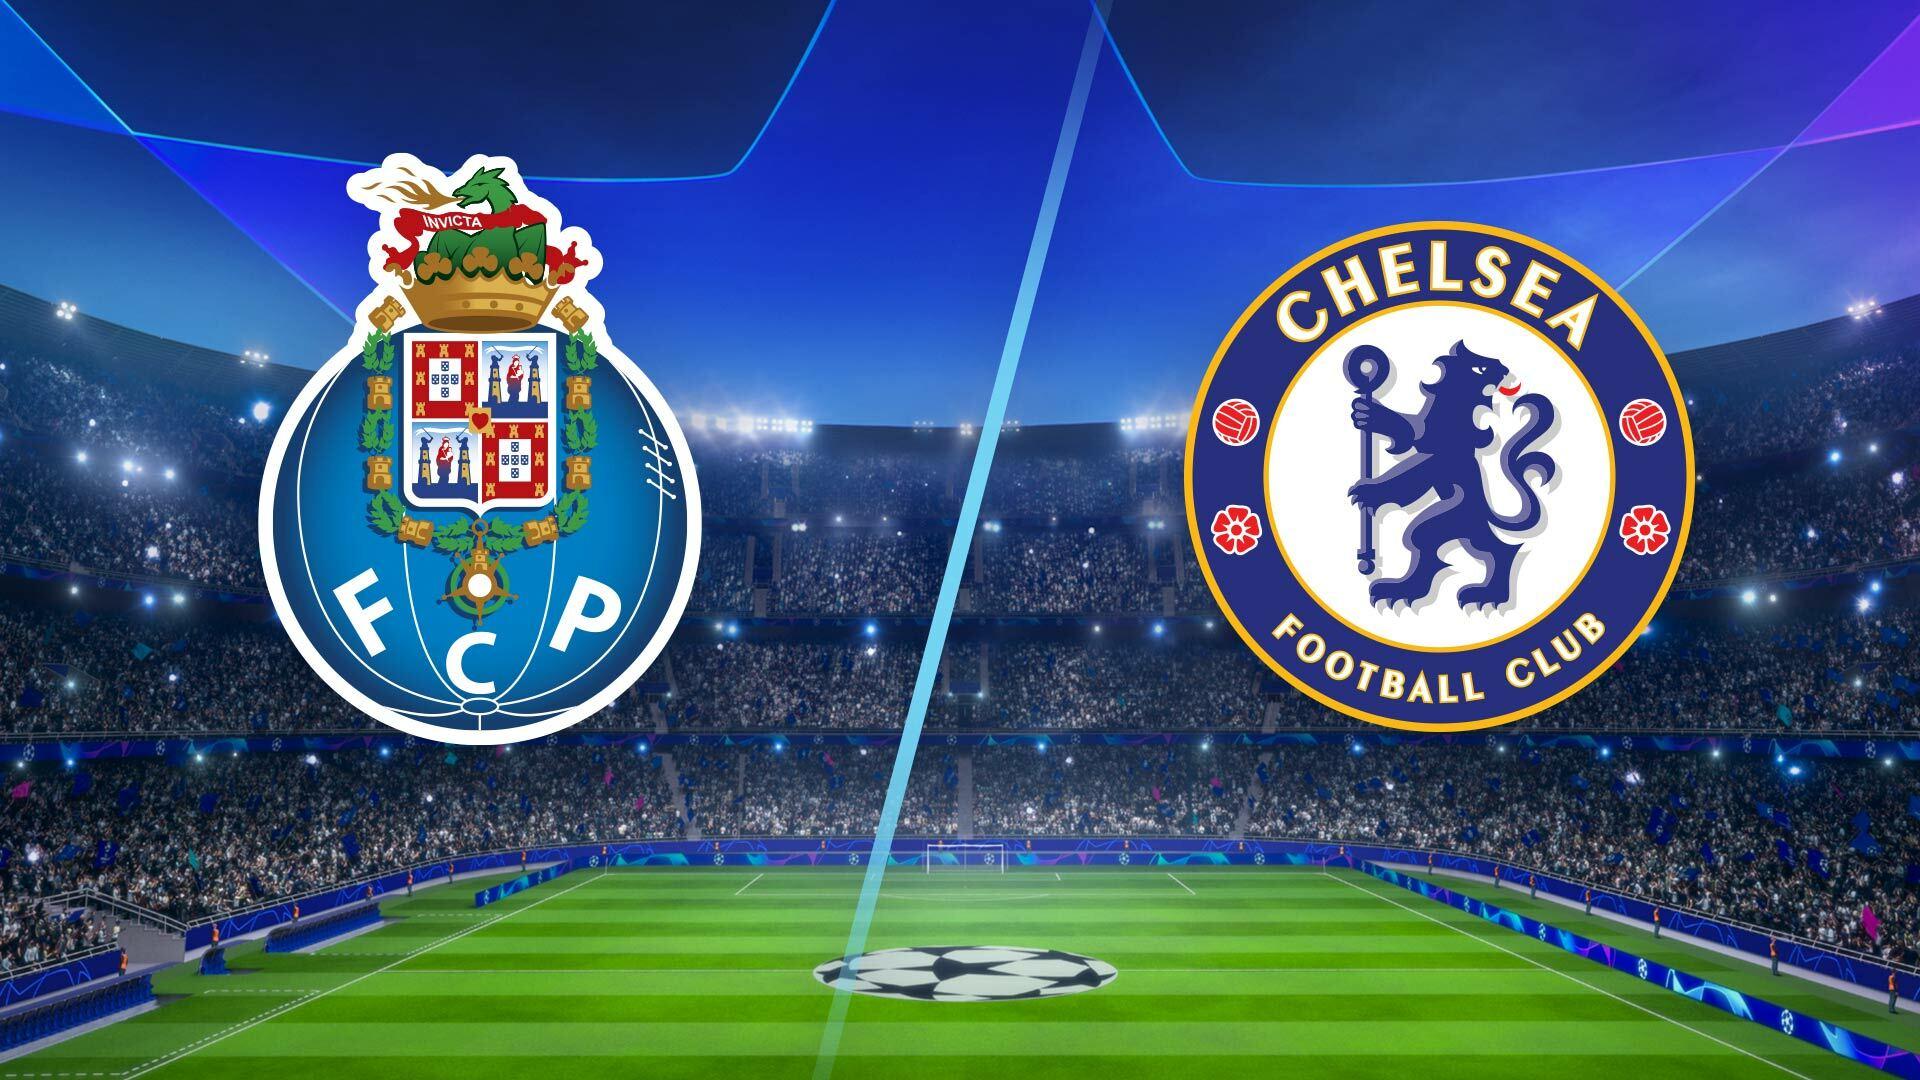 Watch UEFA Champions League Season 2021 Episode 128: Porto vs. Chelsea -  Full show on Paramount Plus